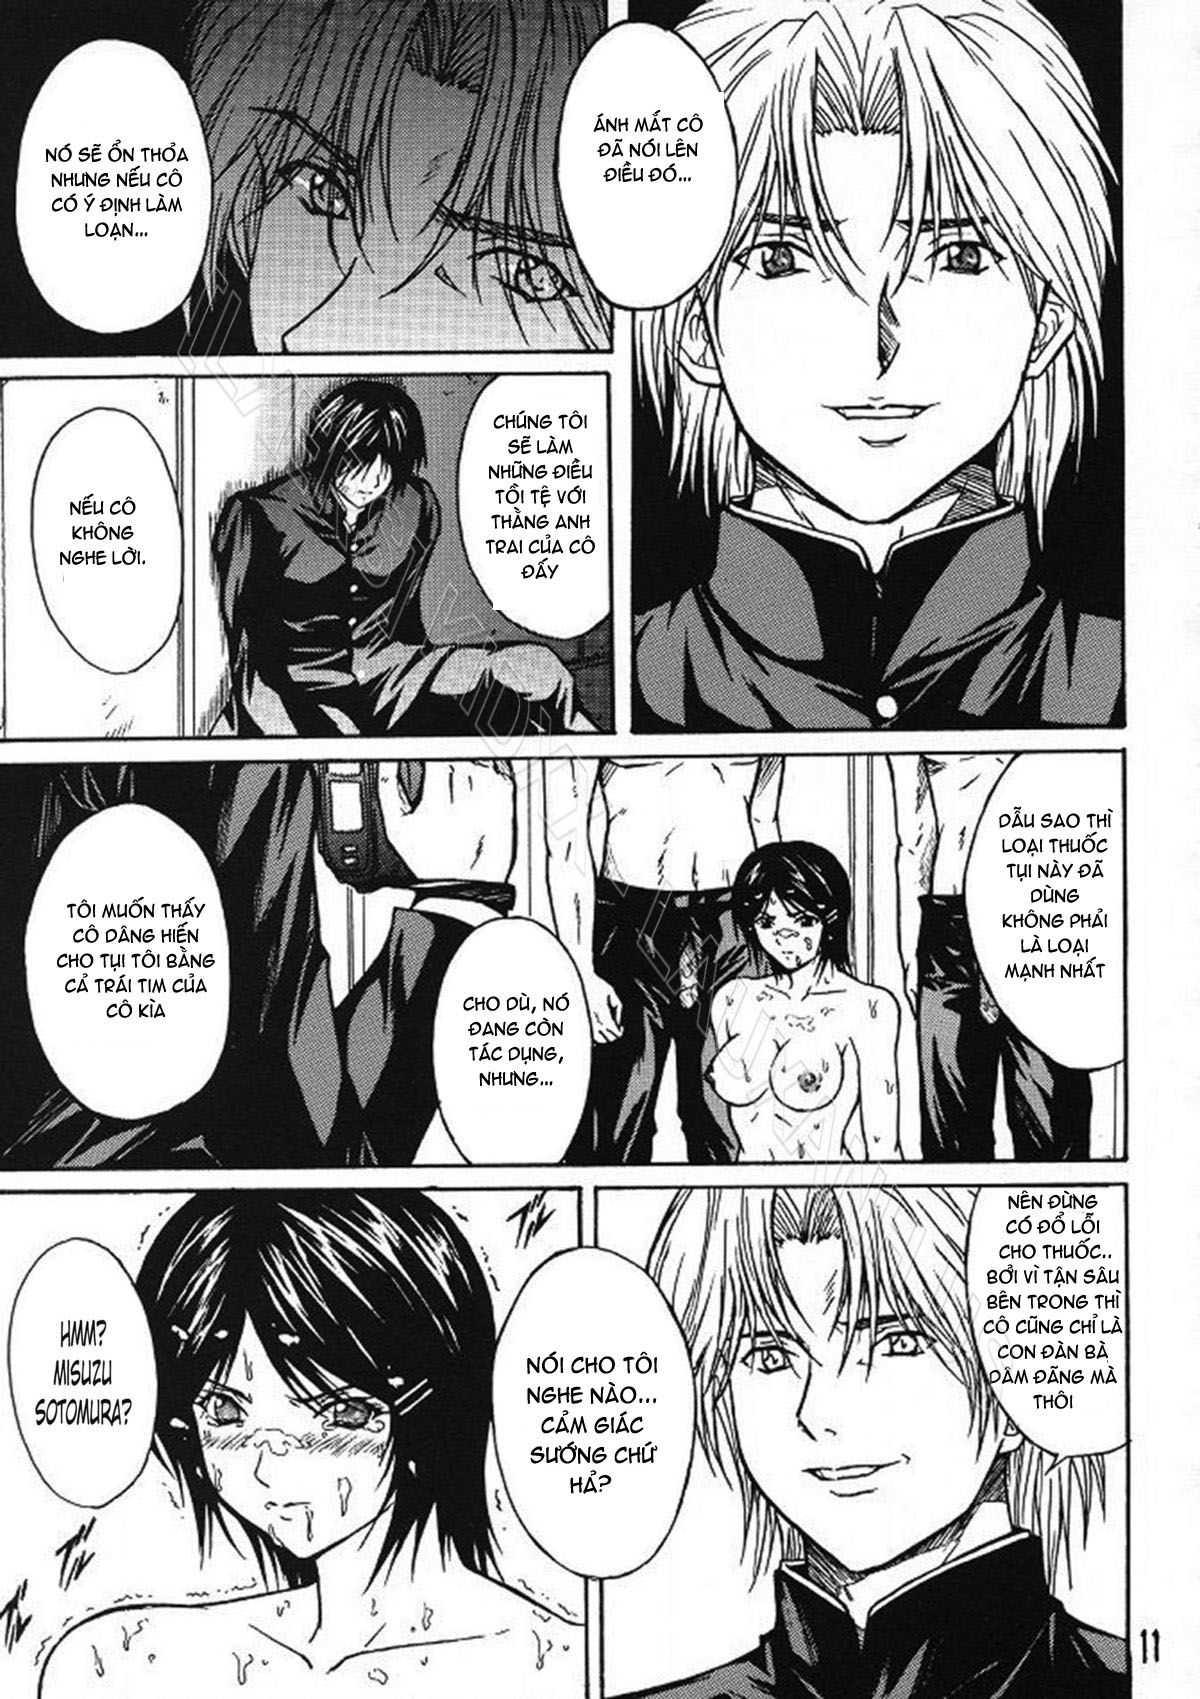 TruyenHay.Com - Ảnh 10 - Ryoujoku Rensa Chapter 2